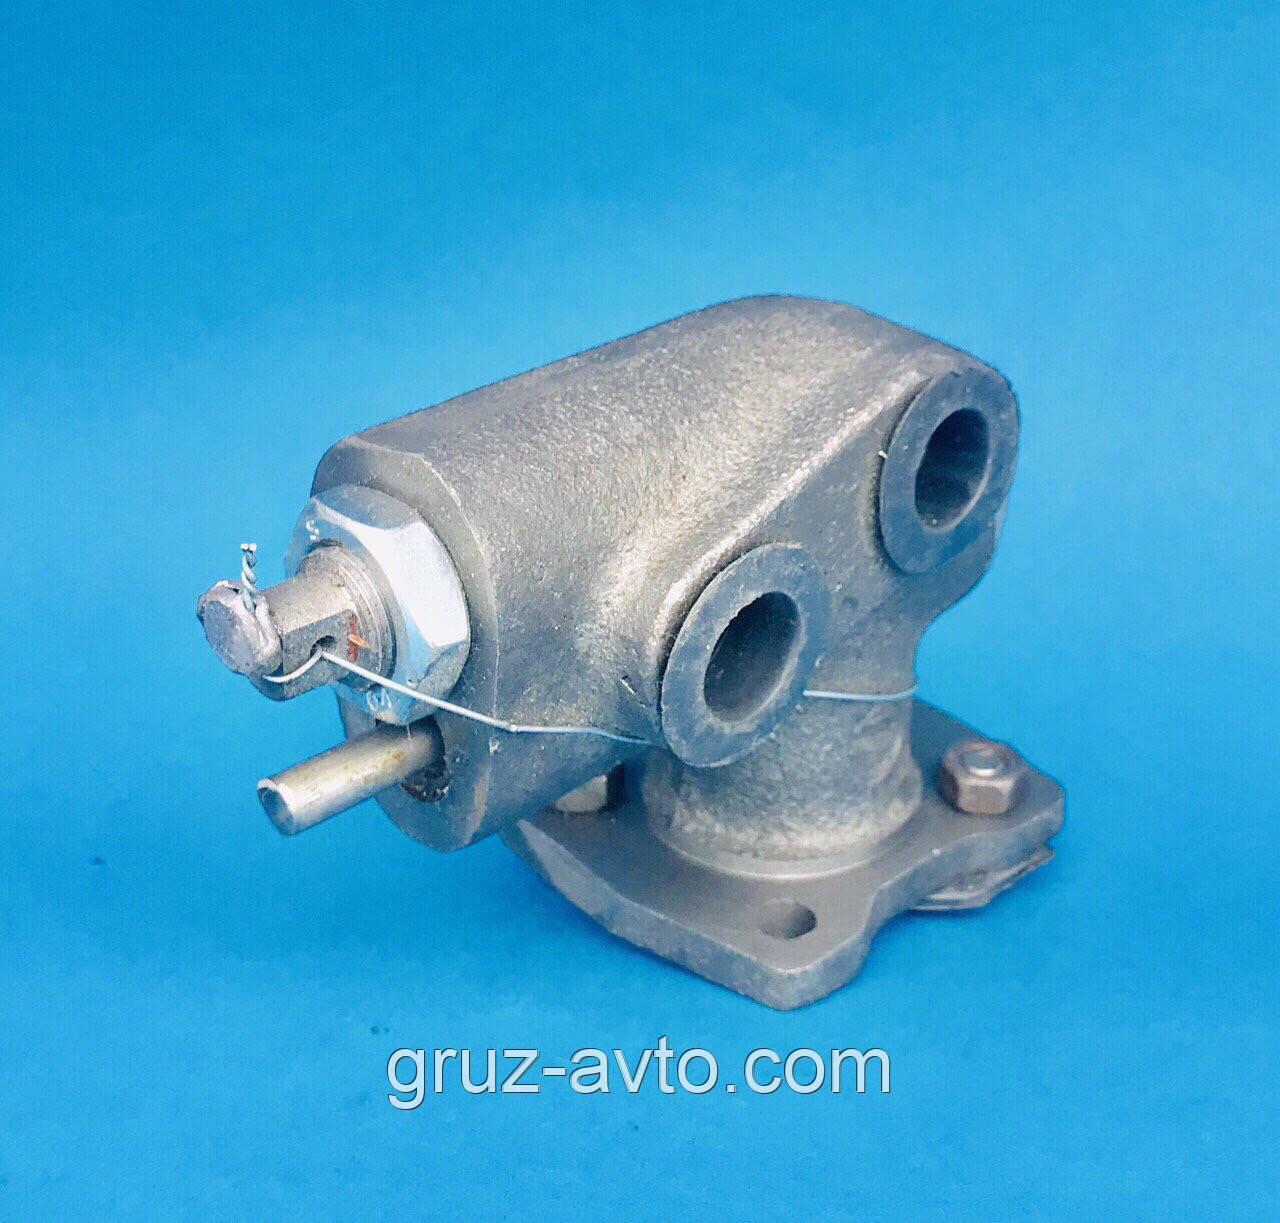 Клапан управления опускания/ подъема кузова ГАЗ-53 / 3307/ 3512-8607010